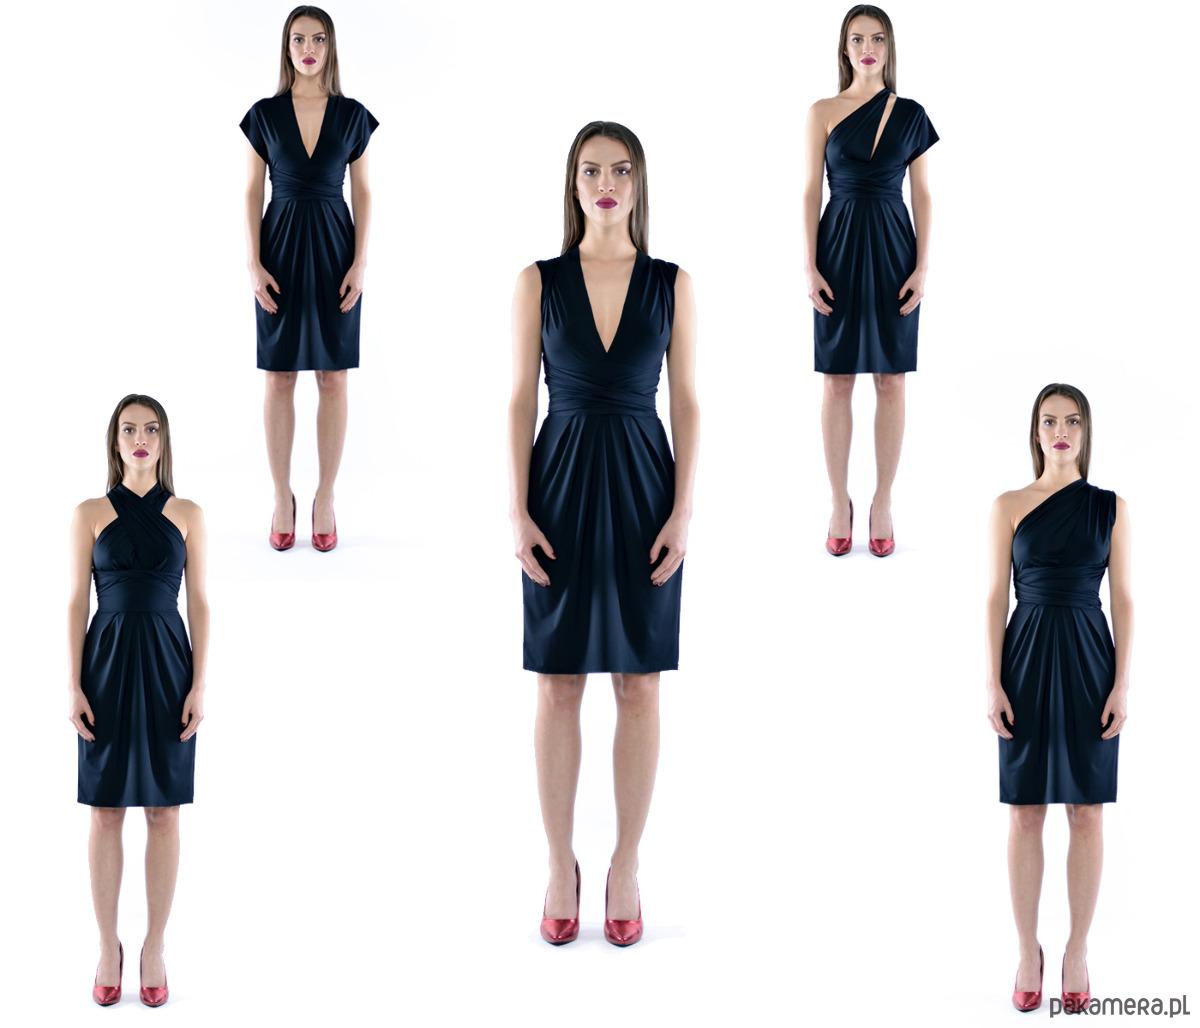 Multistylizacyjna sukienka - creative dress